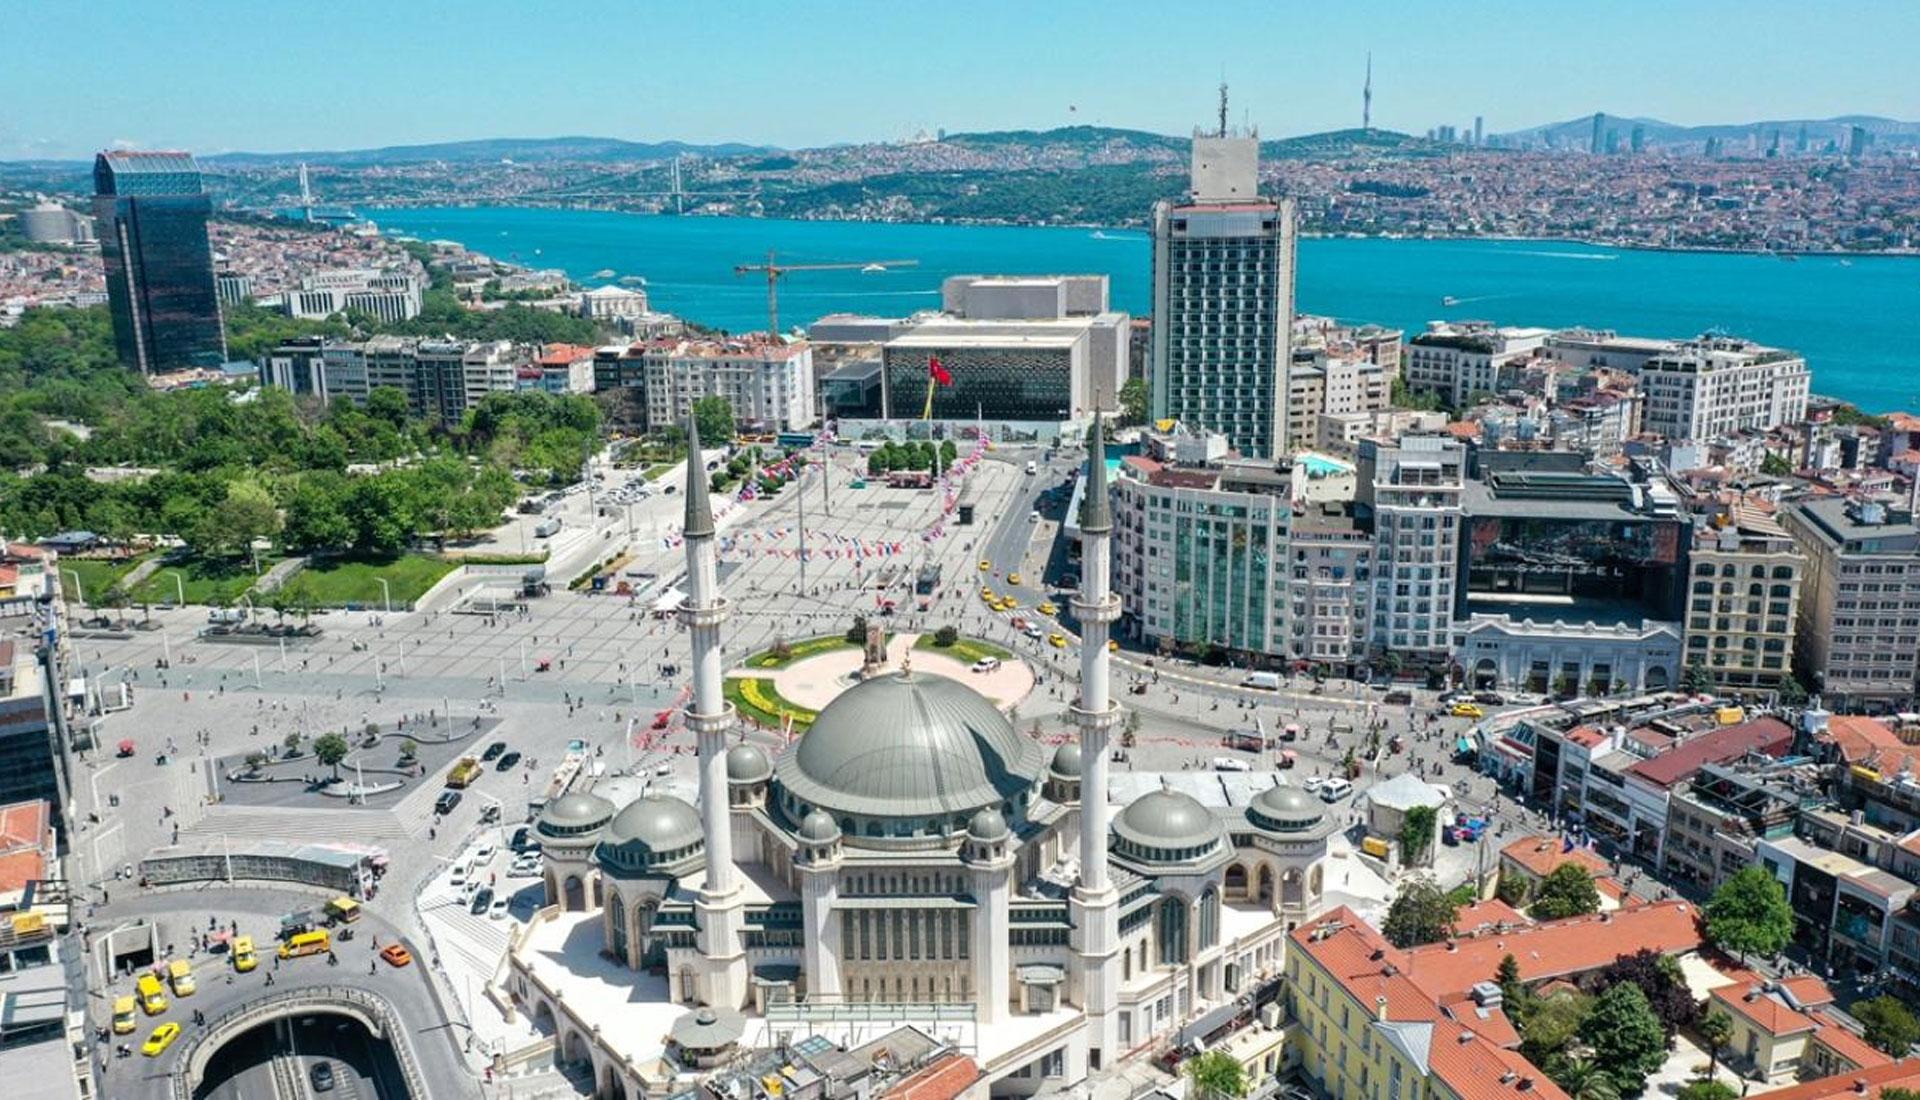 Istanbul Taksim Mosque